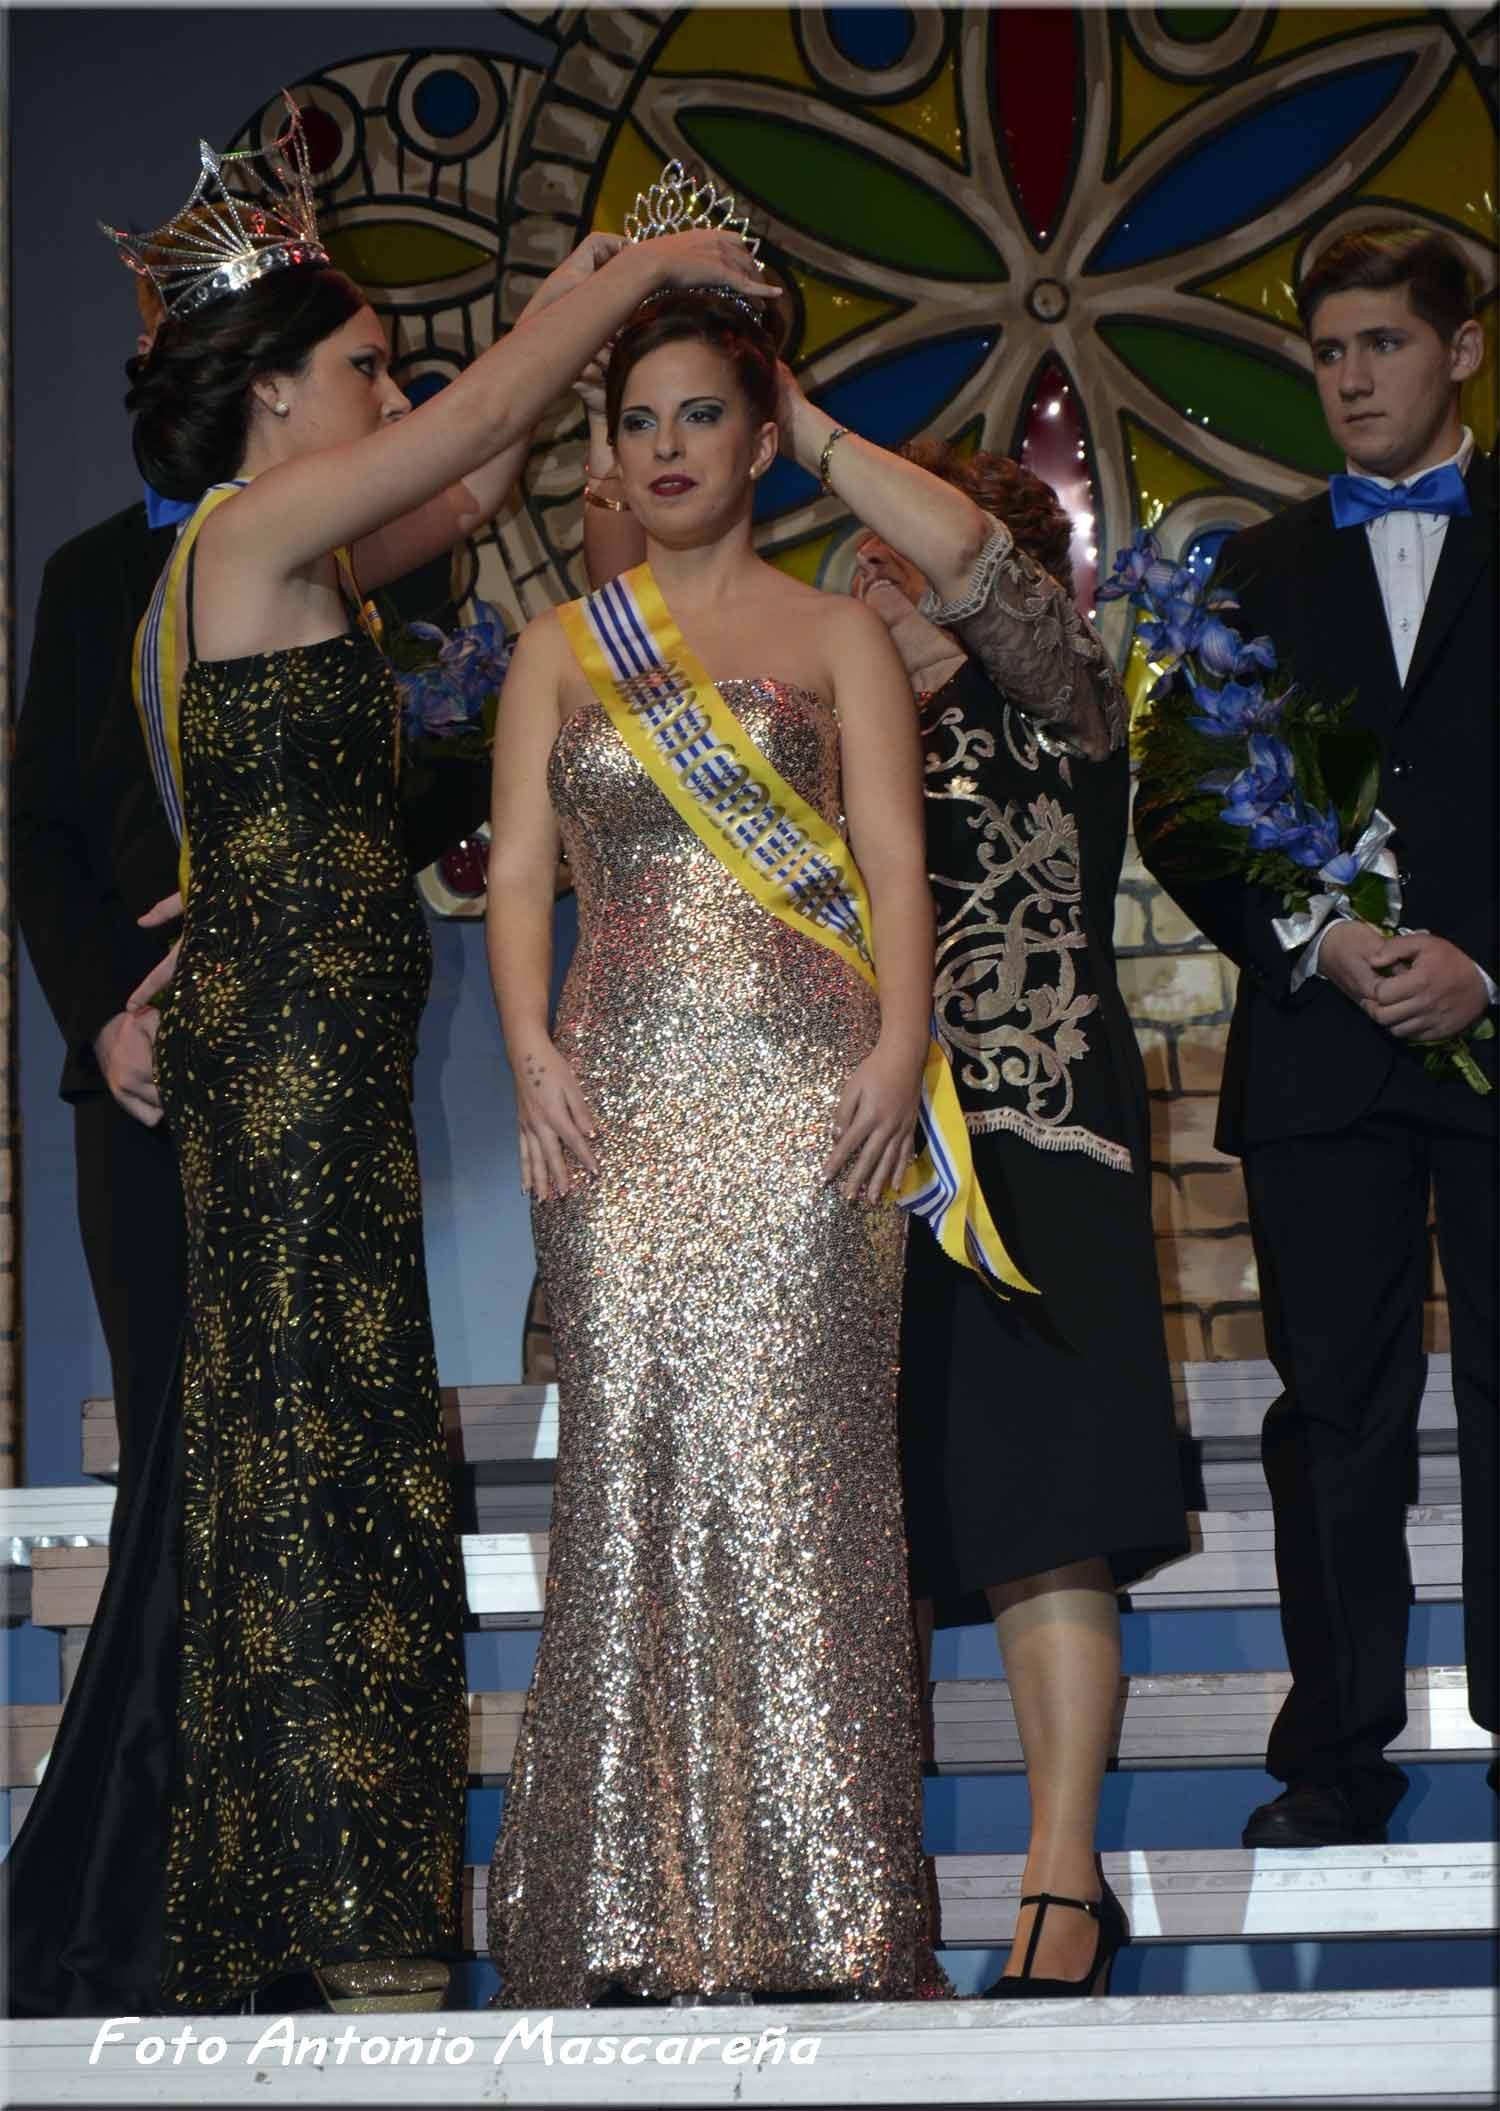 Coronacion reina carnaval isla cristina _DSC0258